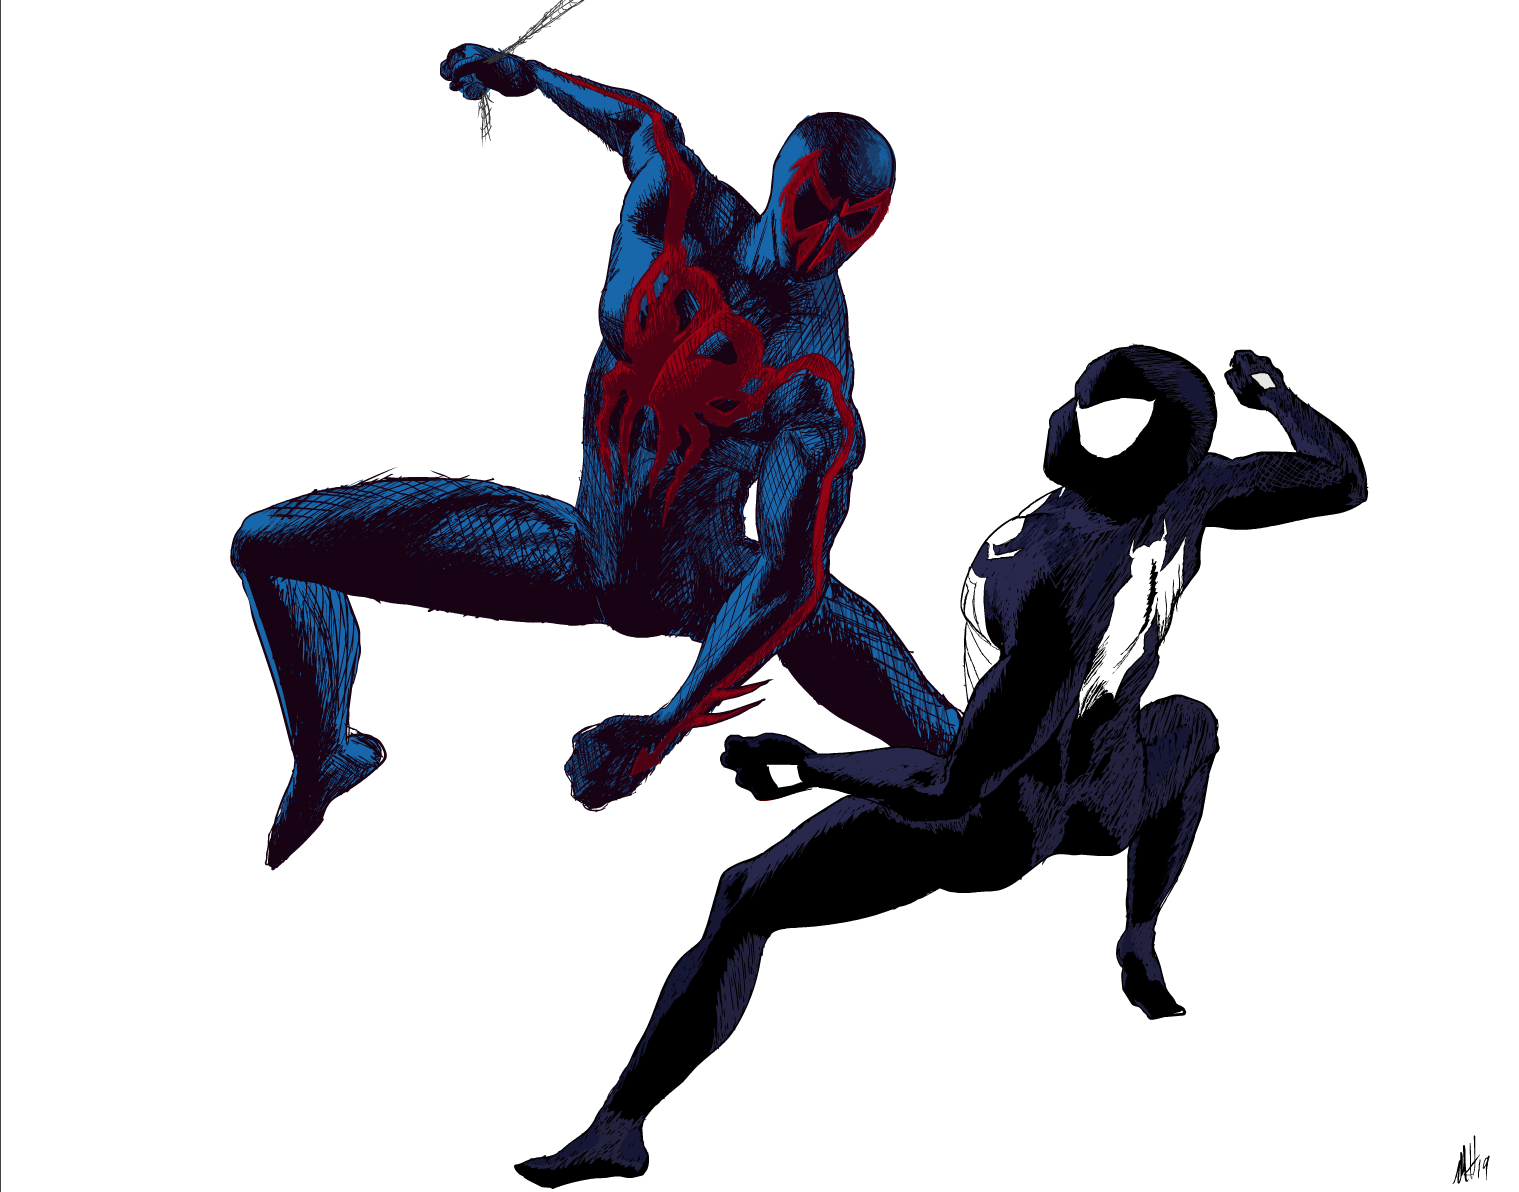 Clash of Spiders